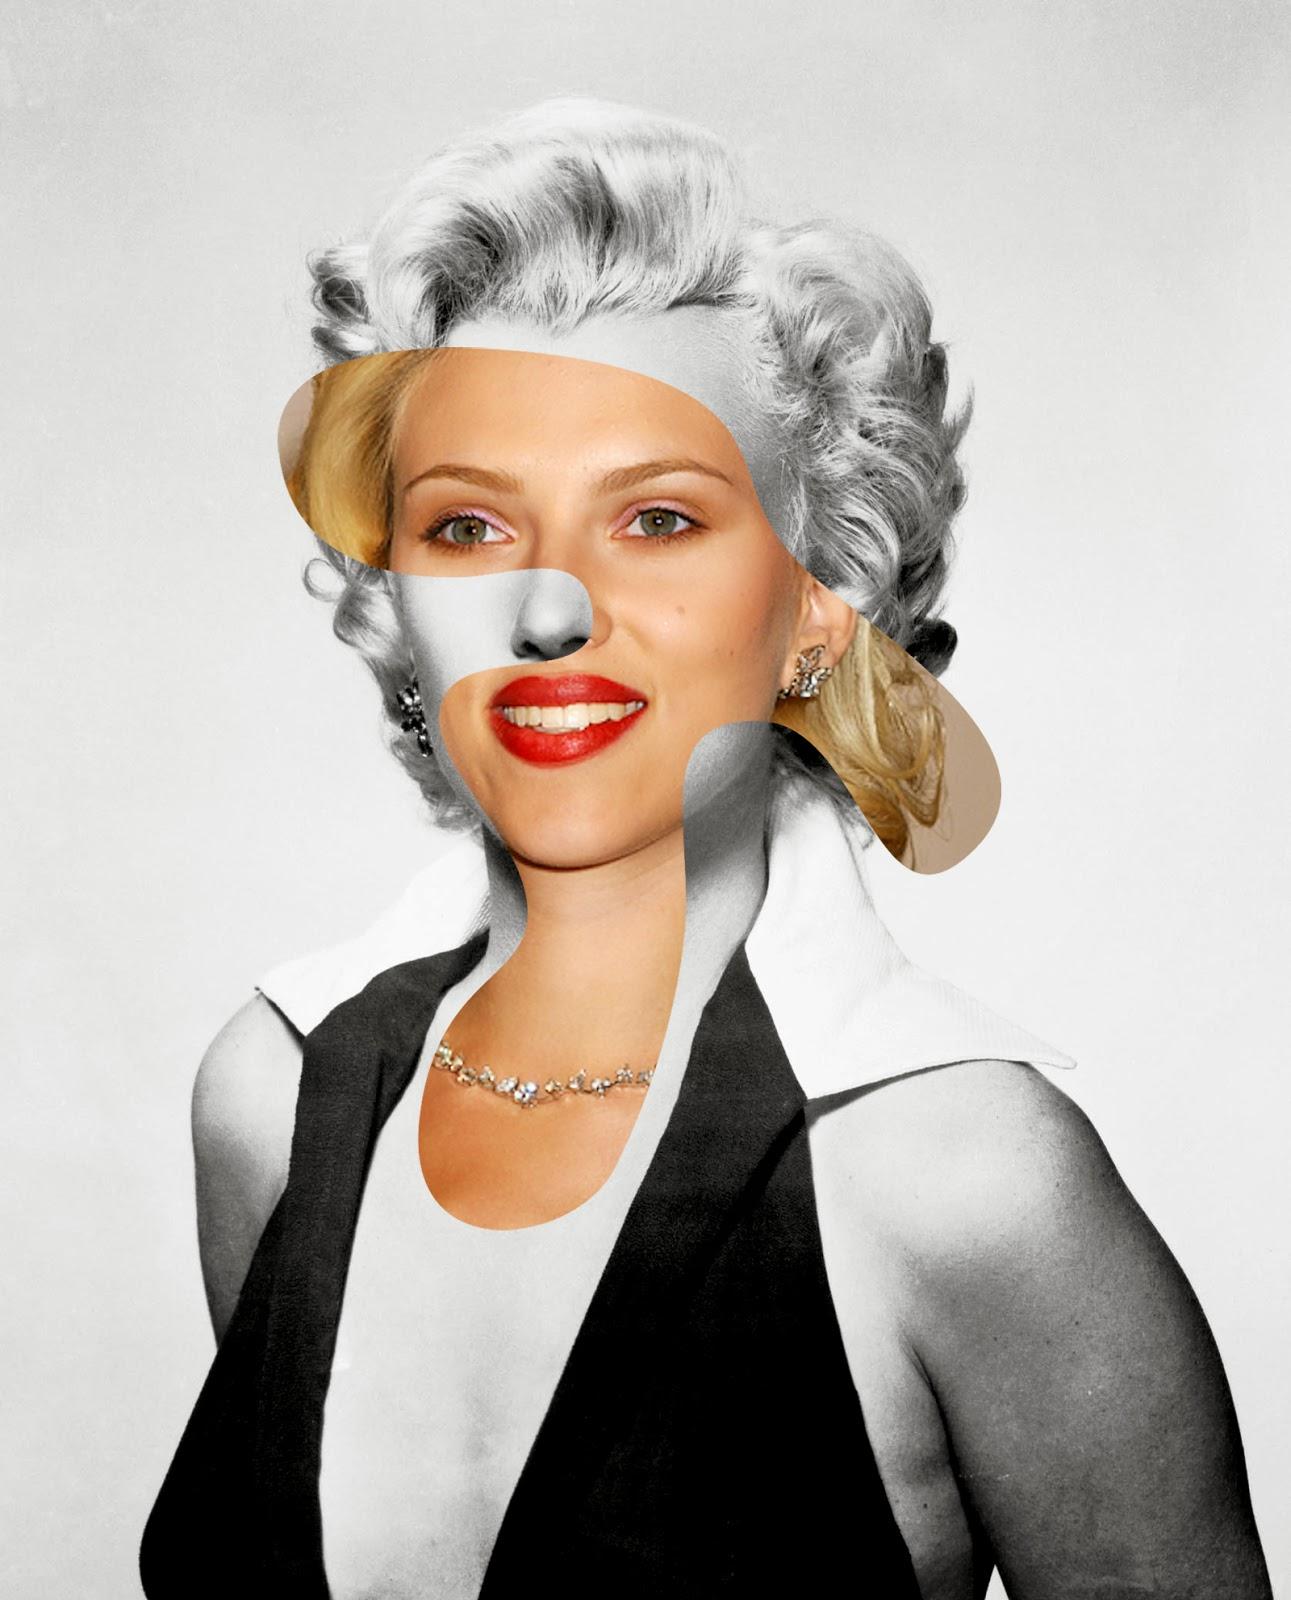 05-Marilyn-Monroe-Scarlett-Johansson-icon-Actor-Mashup-Photos-George-Chamoun-www-designstack-co